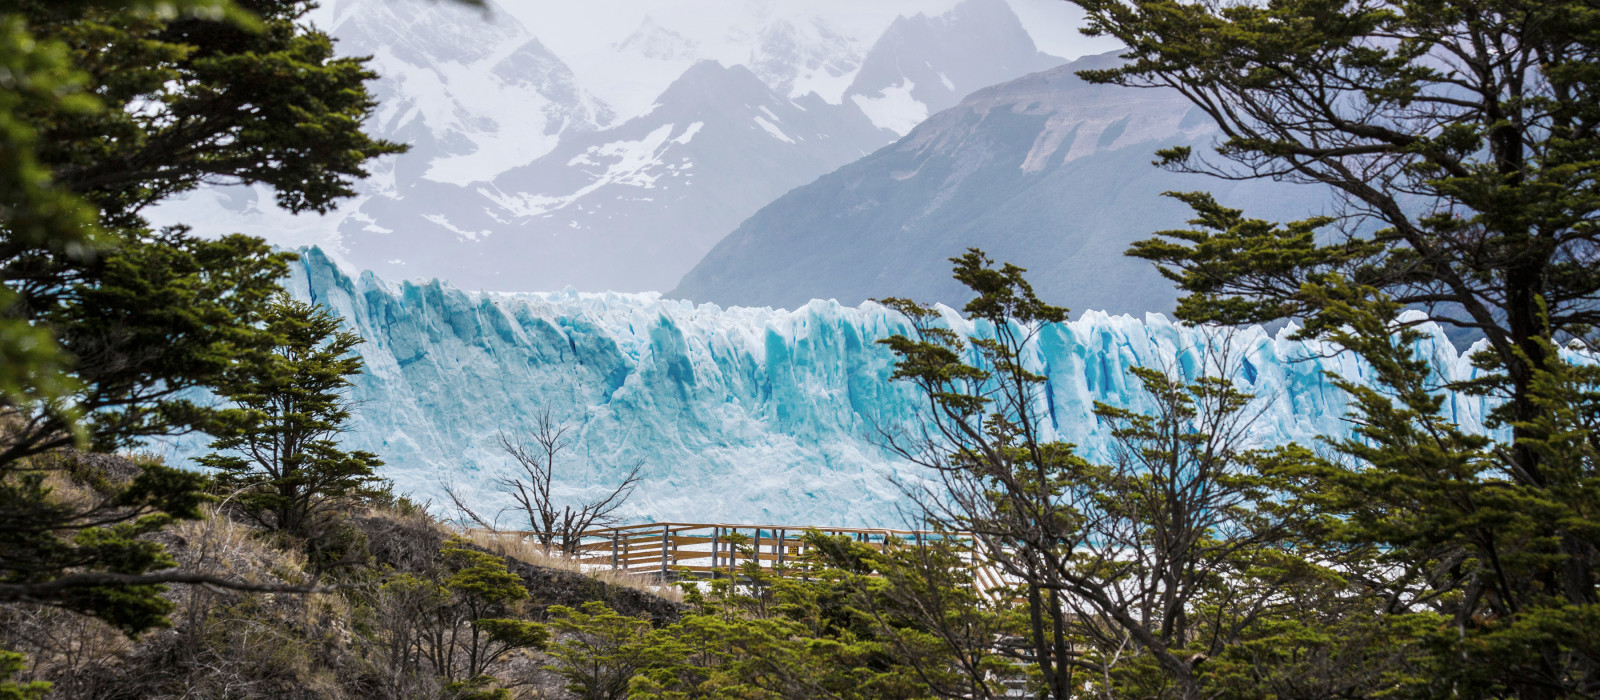 Perito Moreno Gletscher im Los Glaciares Nationalpark in Patagonien, Argentinie